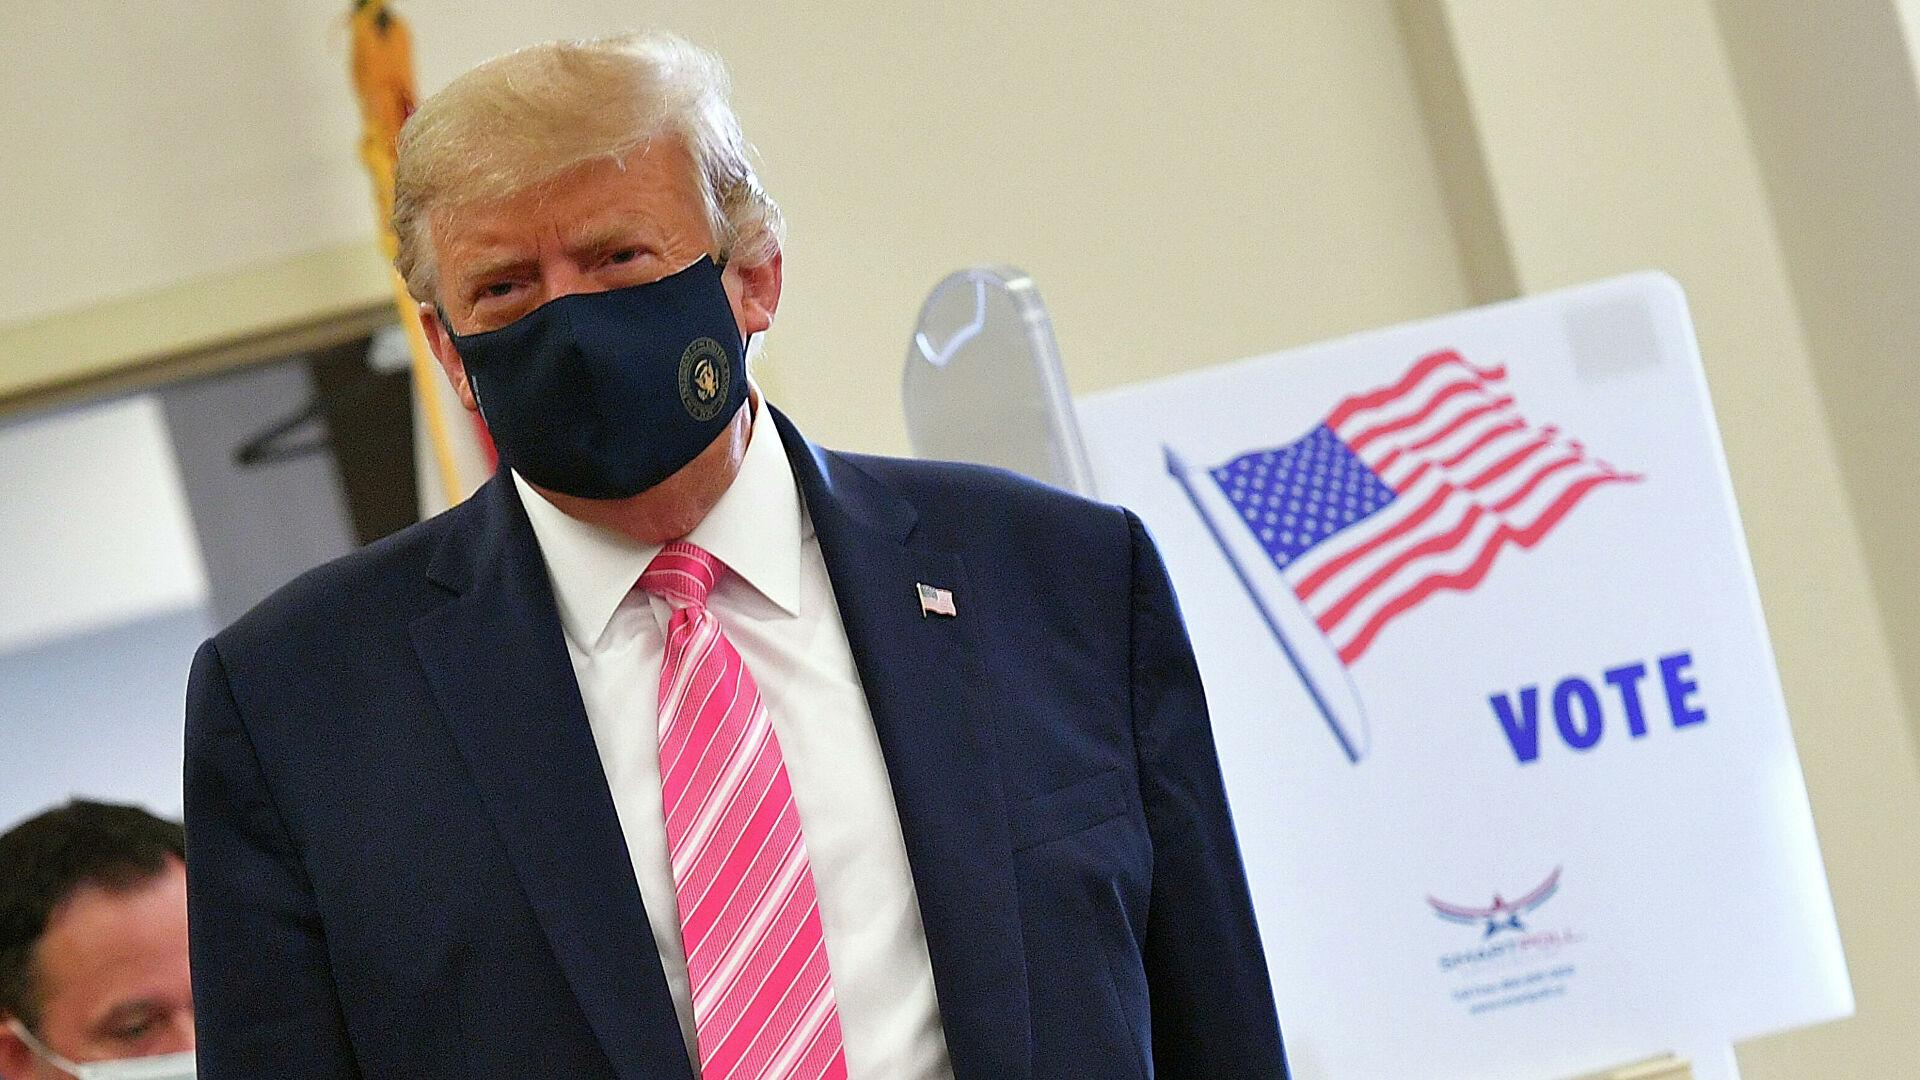 Трамп досрочно проголосовал на выборах президента США